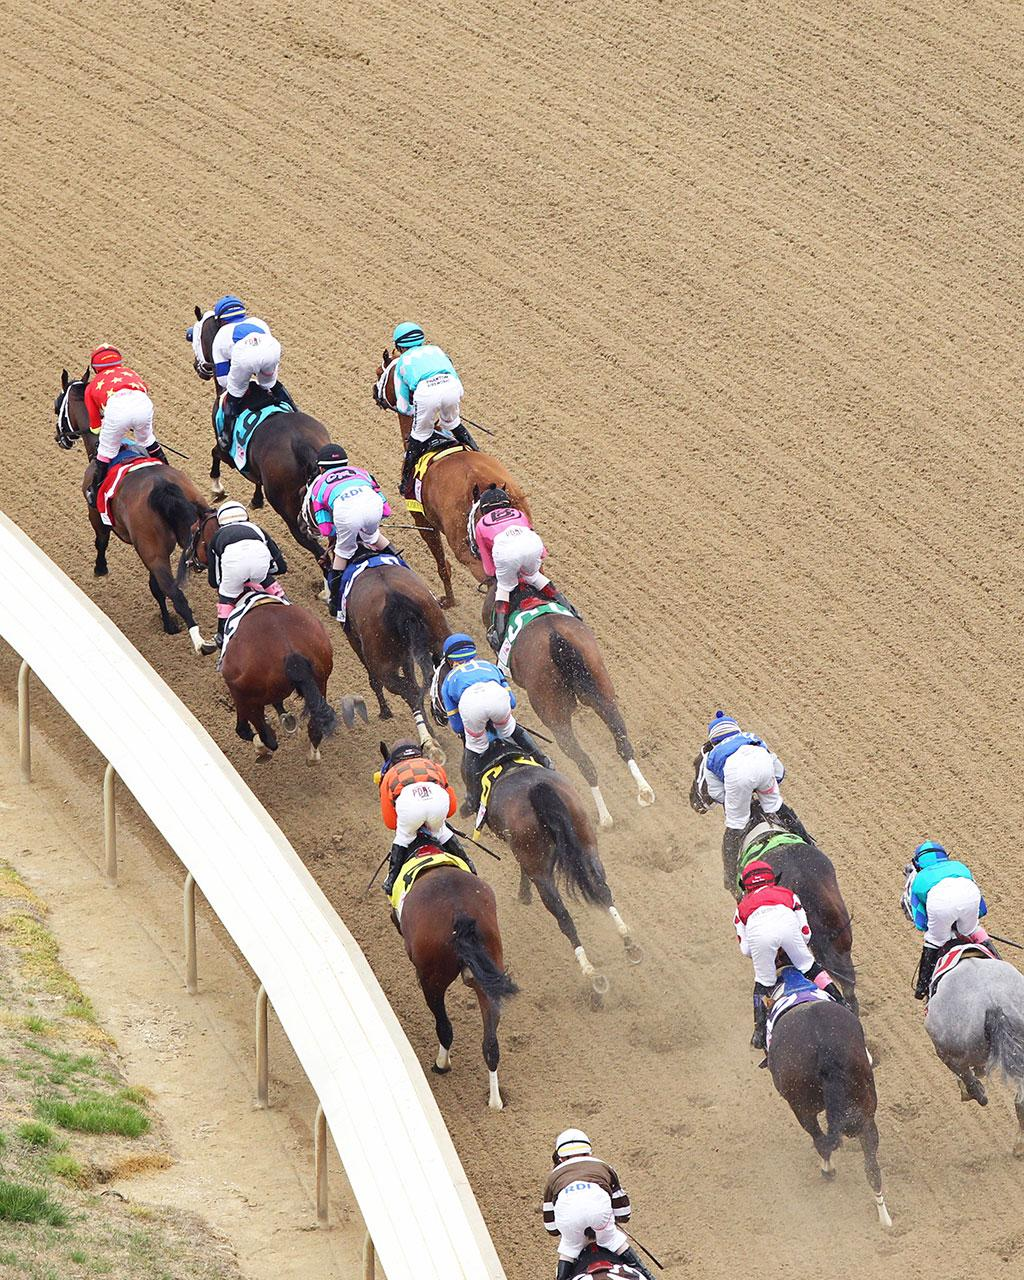 MONOMOY-GIRL---Longines-Kentucky-Oaks---G1---144th-Running---05-04-18---R11---CD---Aerial-First-Turn-01